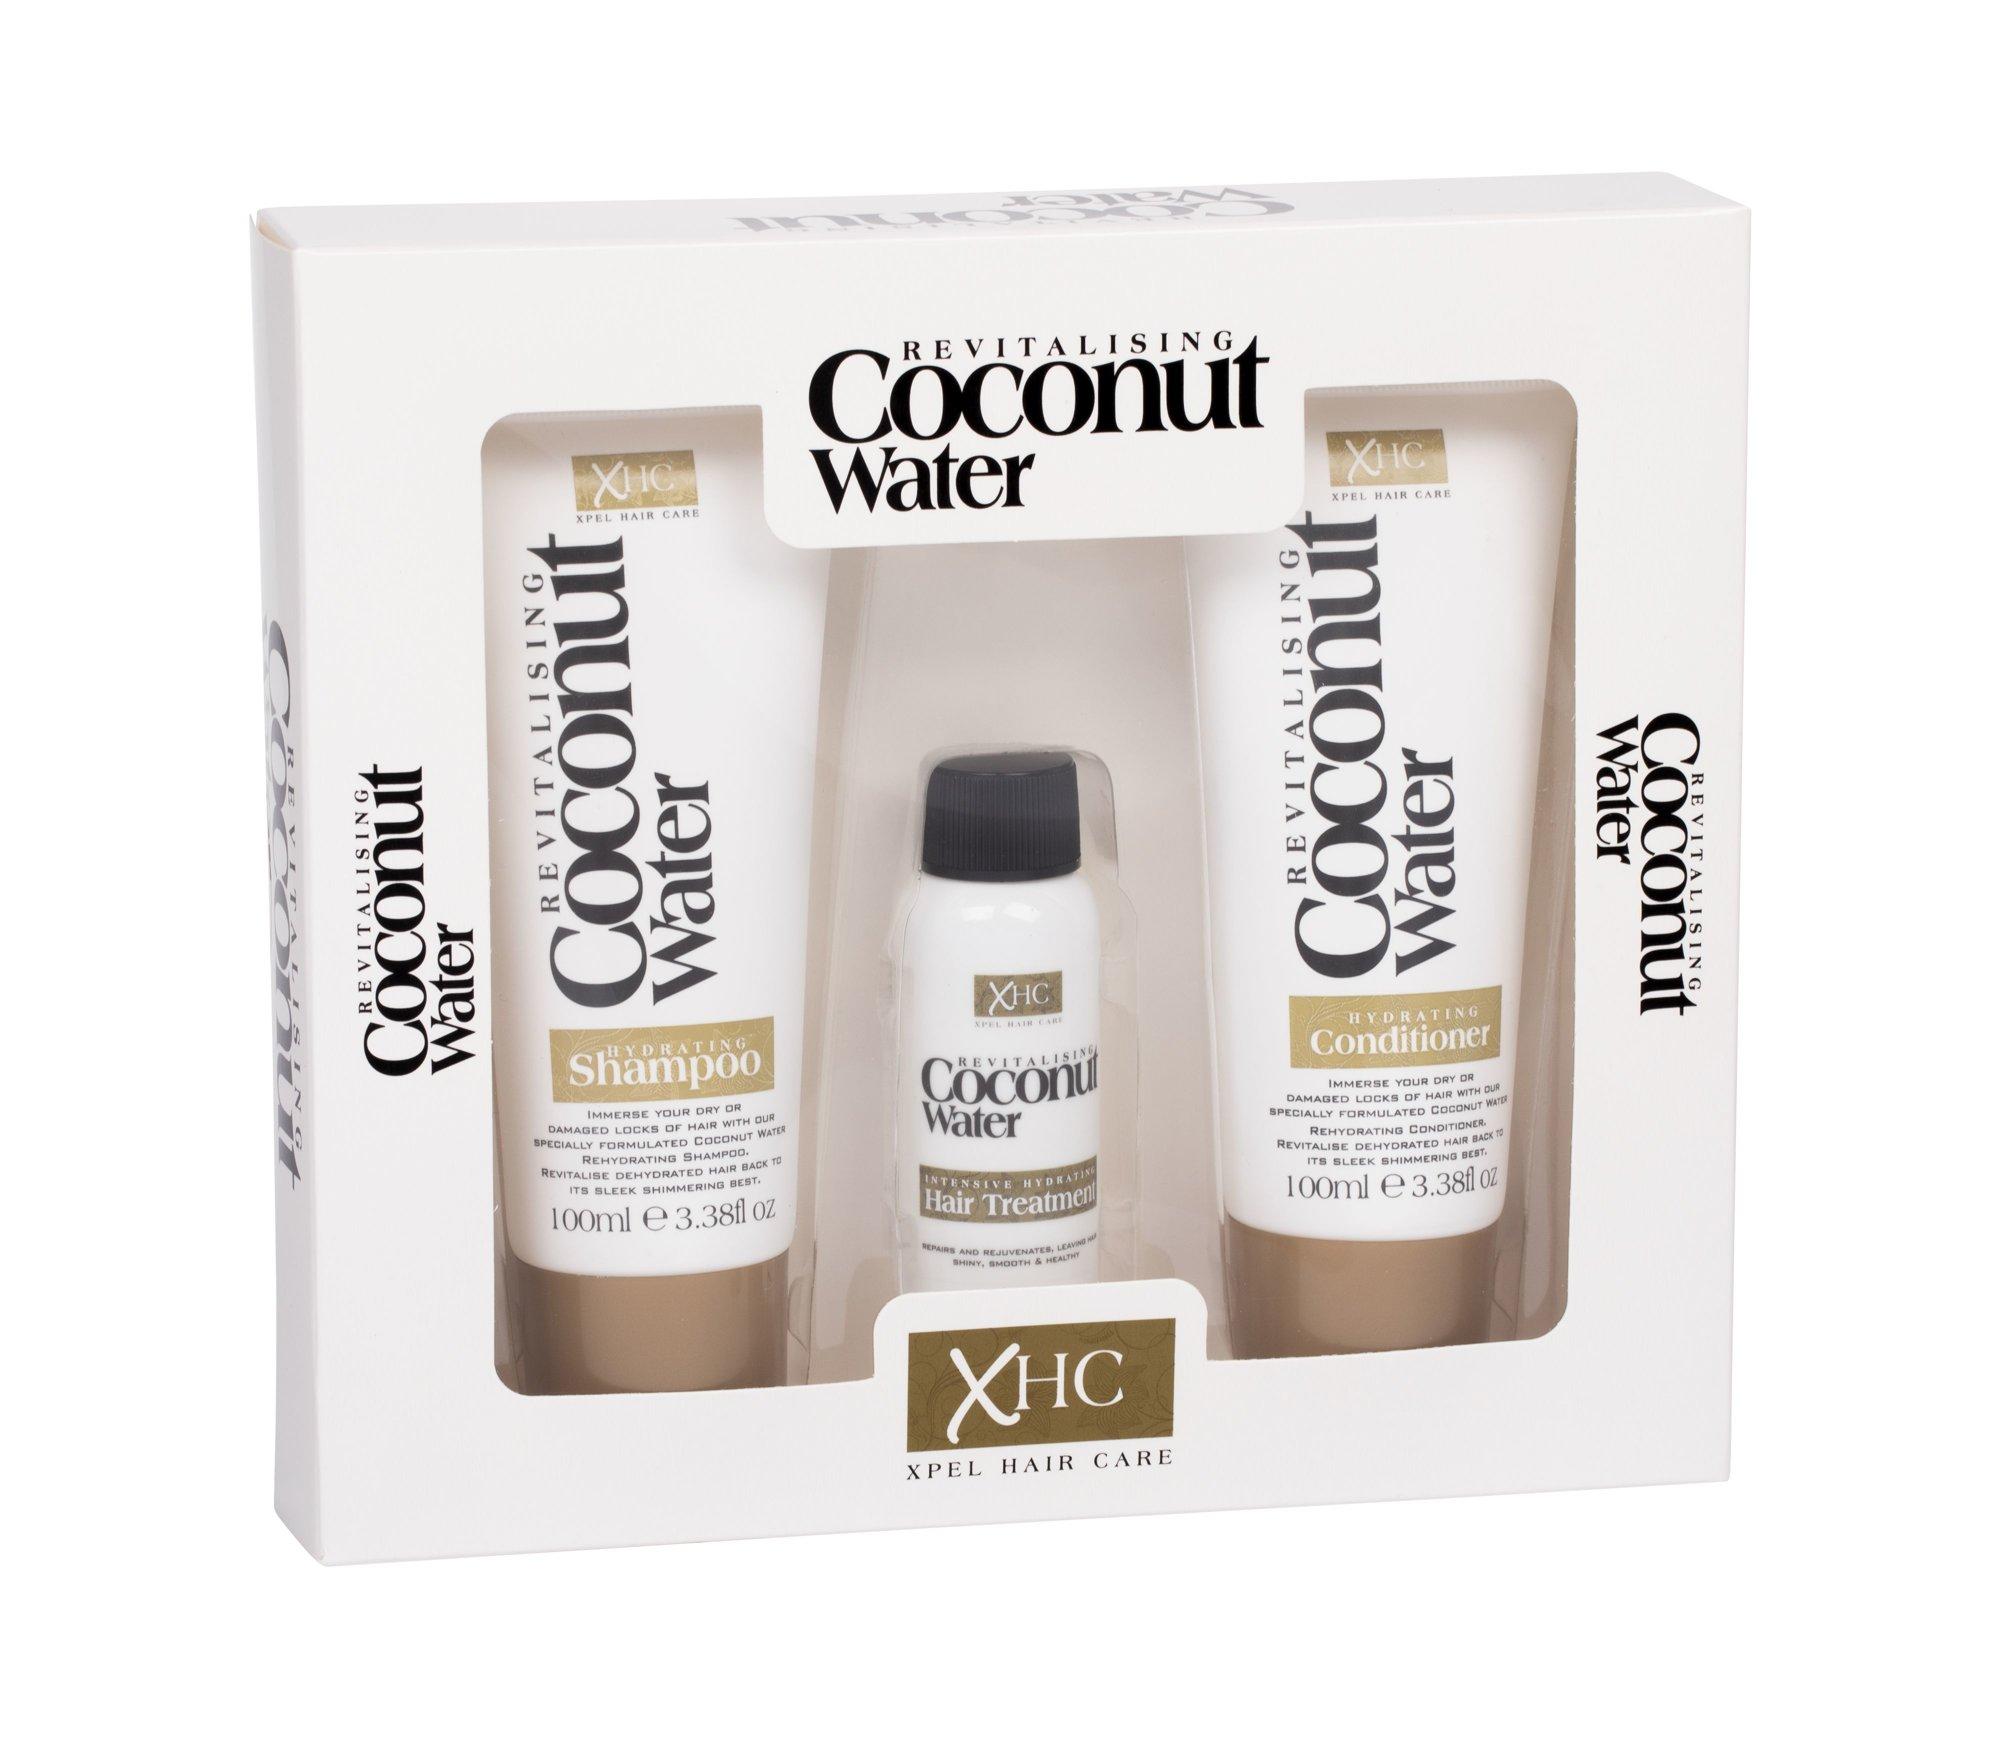 Xpel Coconut Water Shampoo 100ml